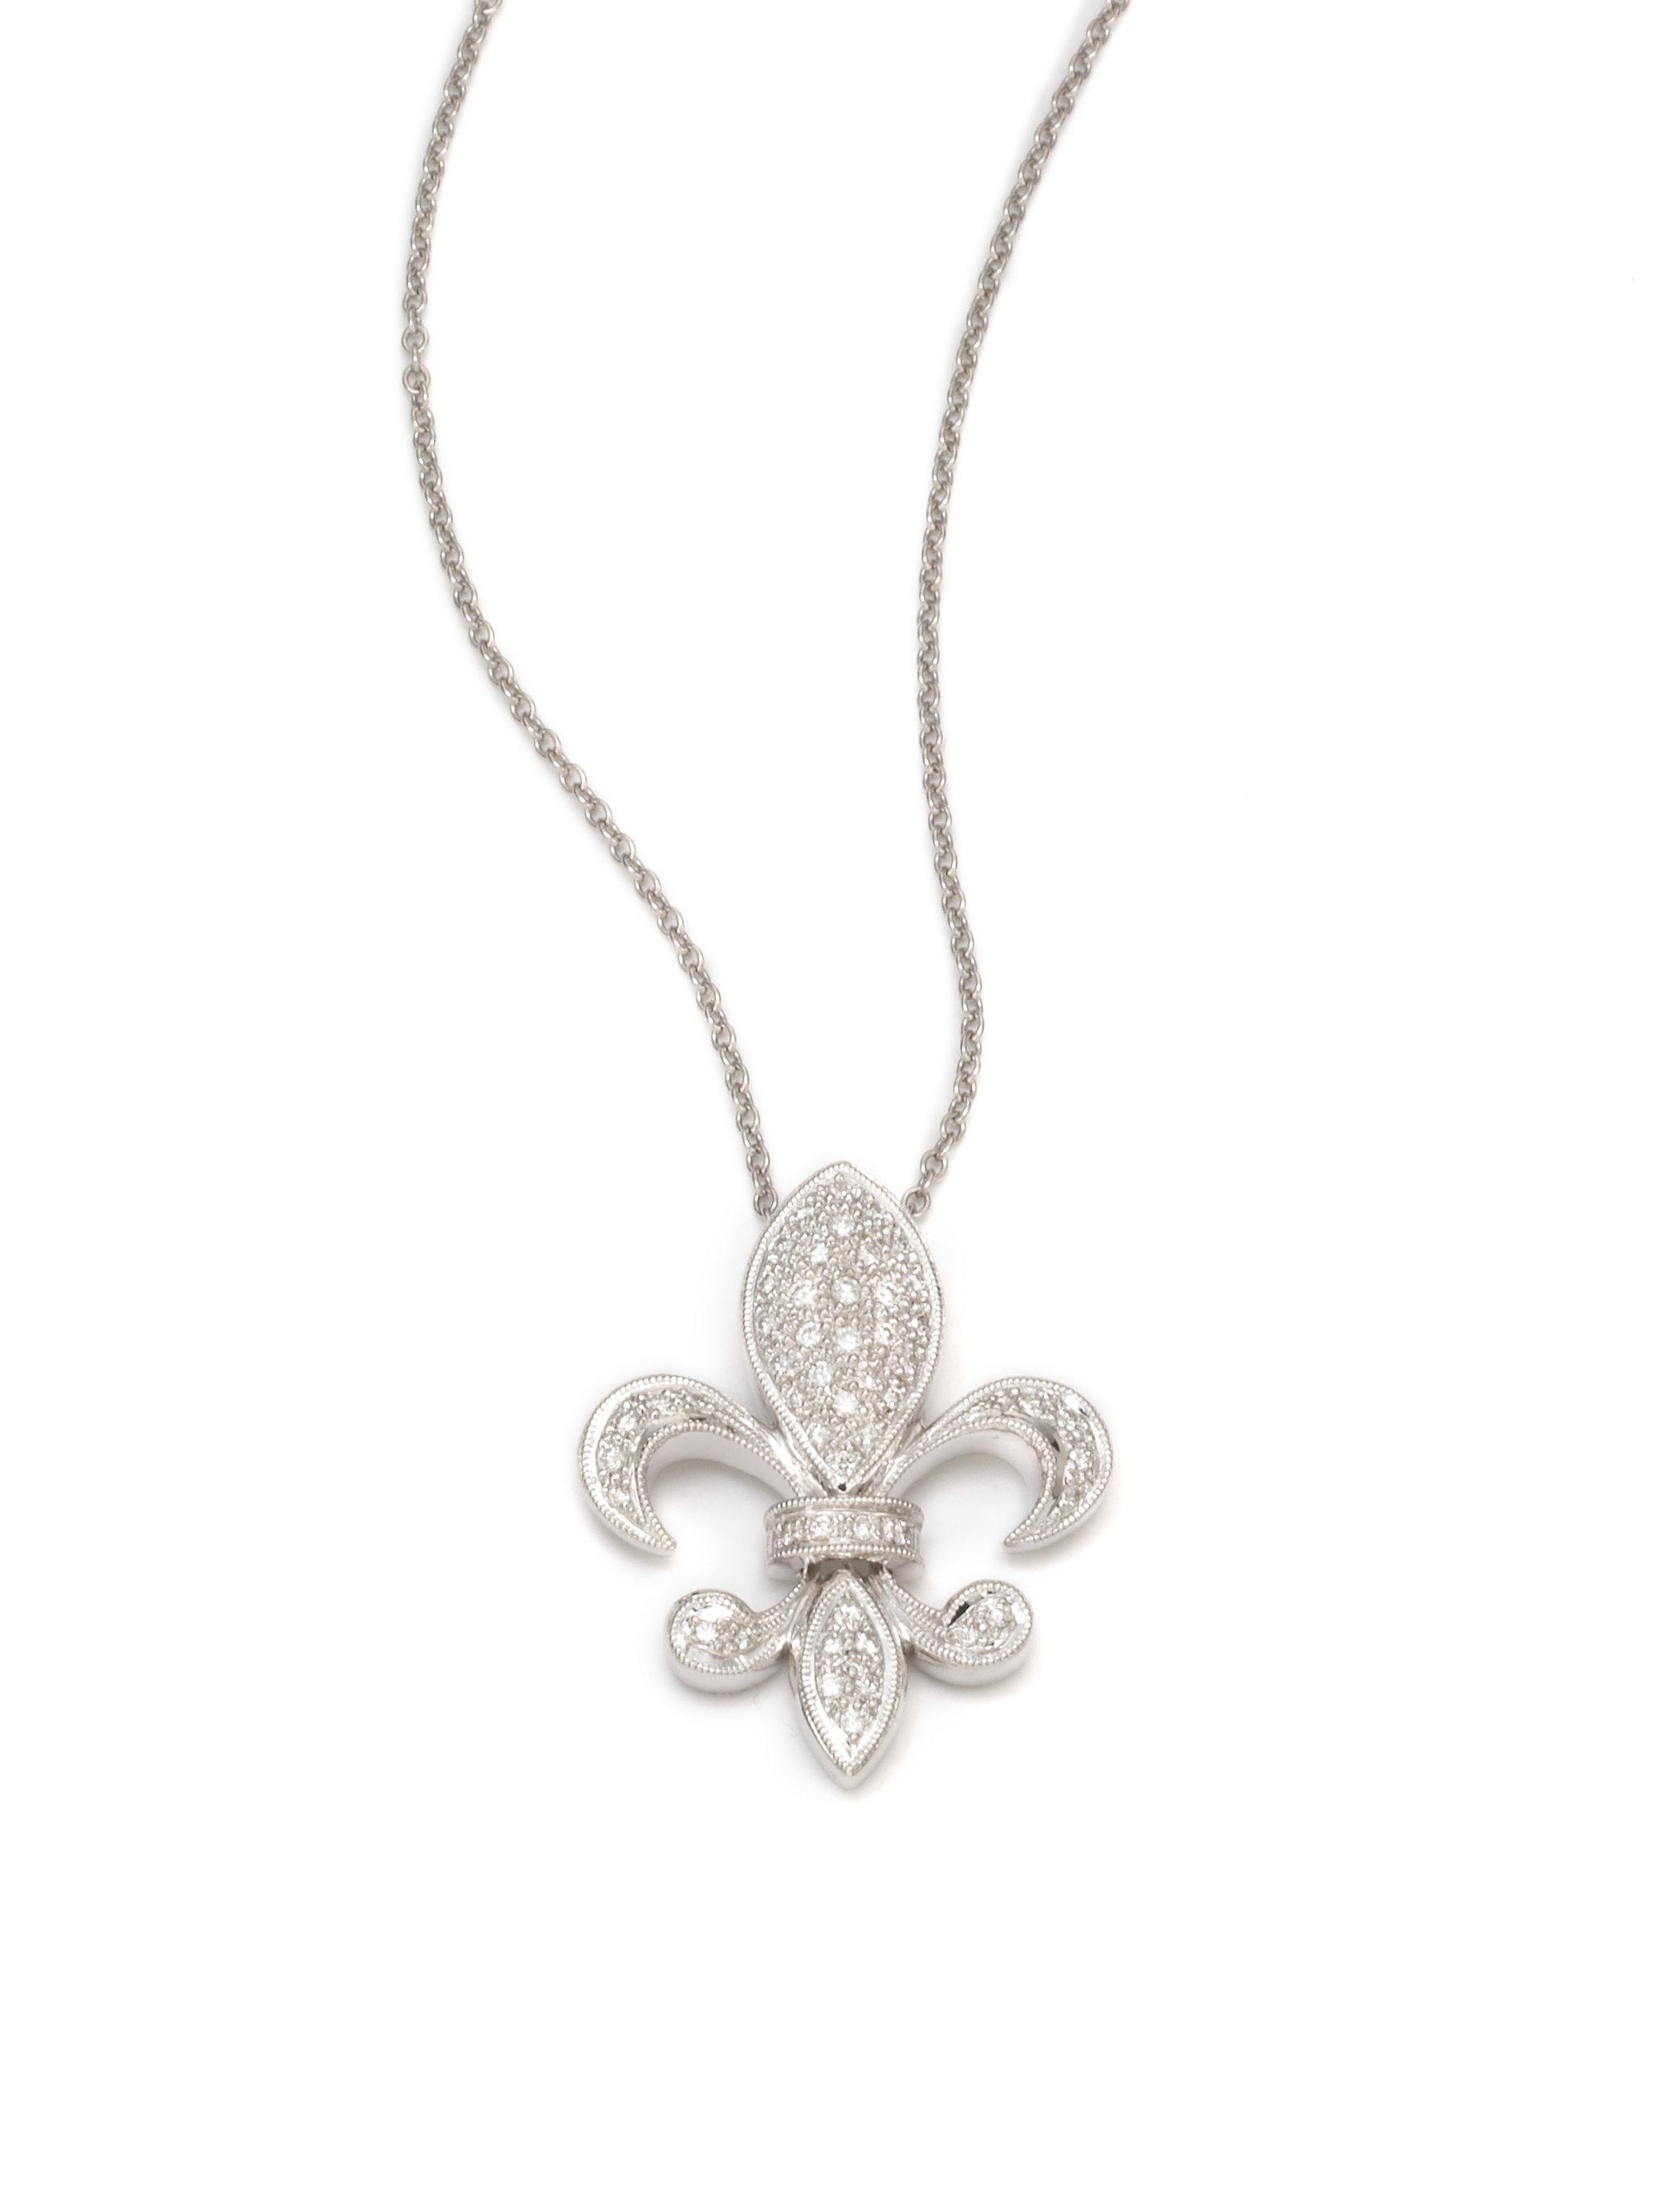 Lyst kc designs diamond fleur de lis pendant necklace in metallic gallery aloadofball Choice Image